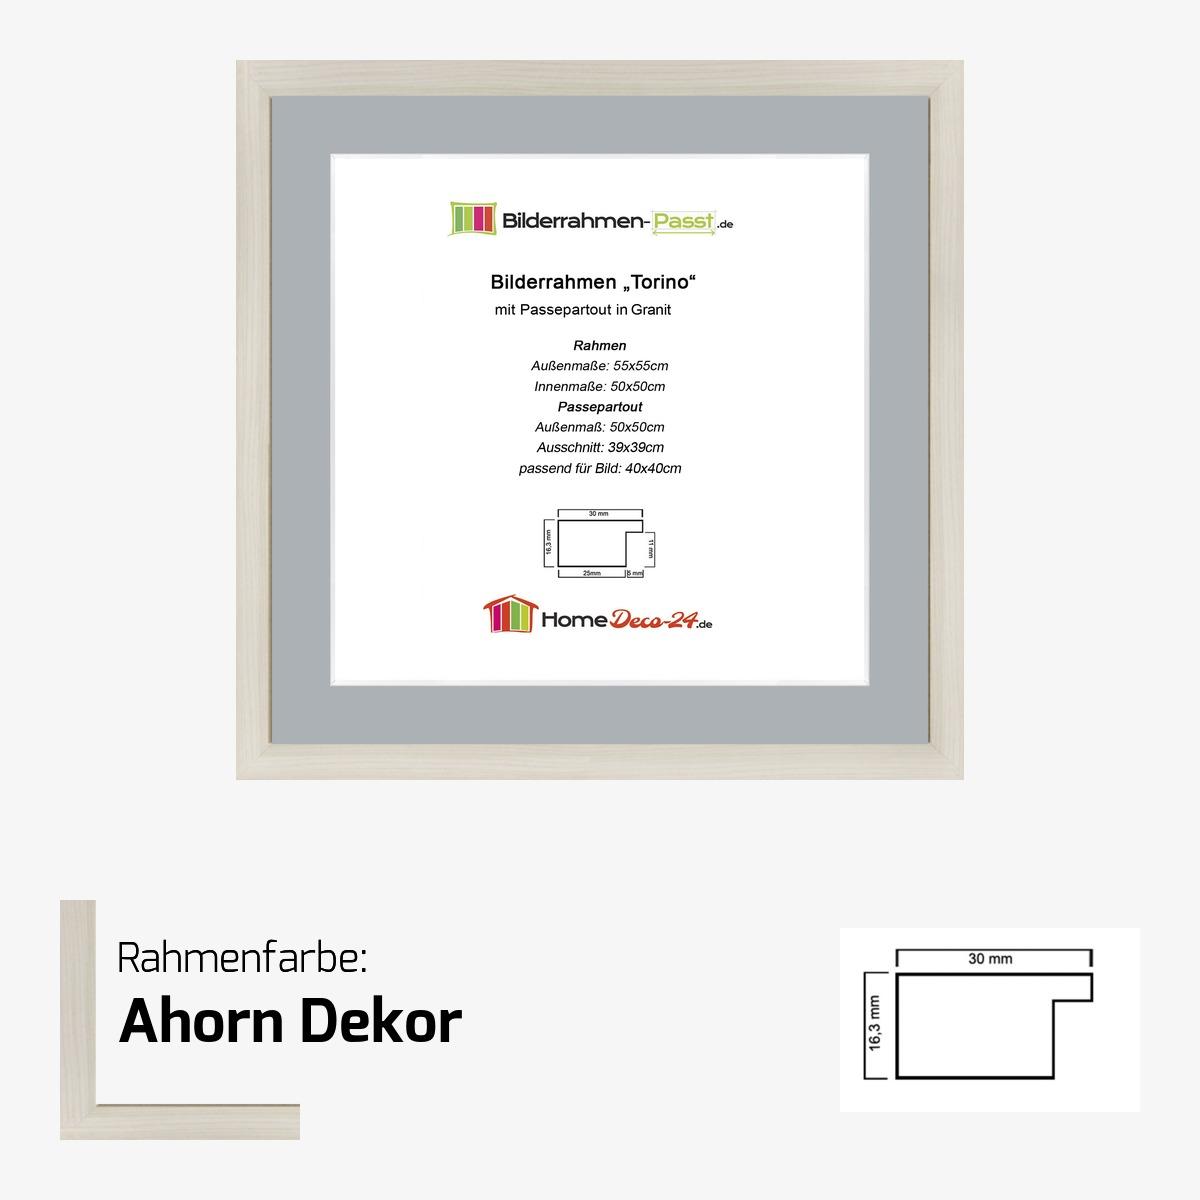 Bilderrahmen torino farbwahl 50x50 cm passepartout for Fenster 50x50